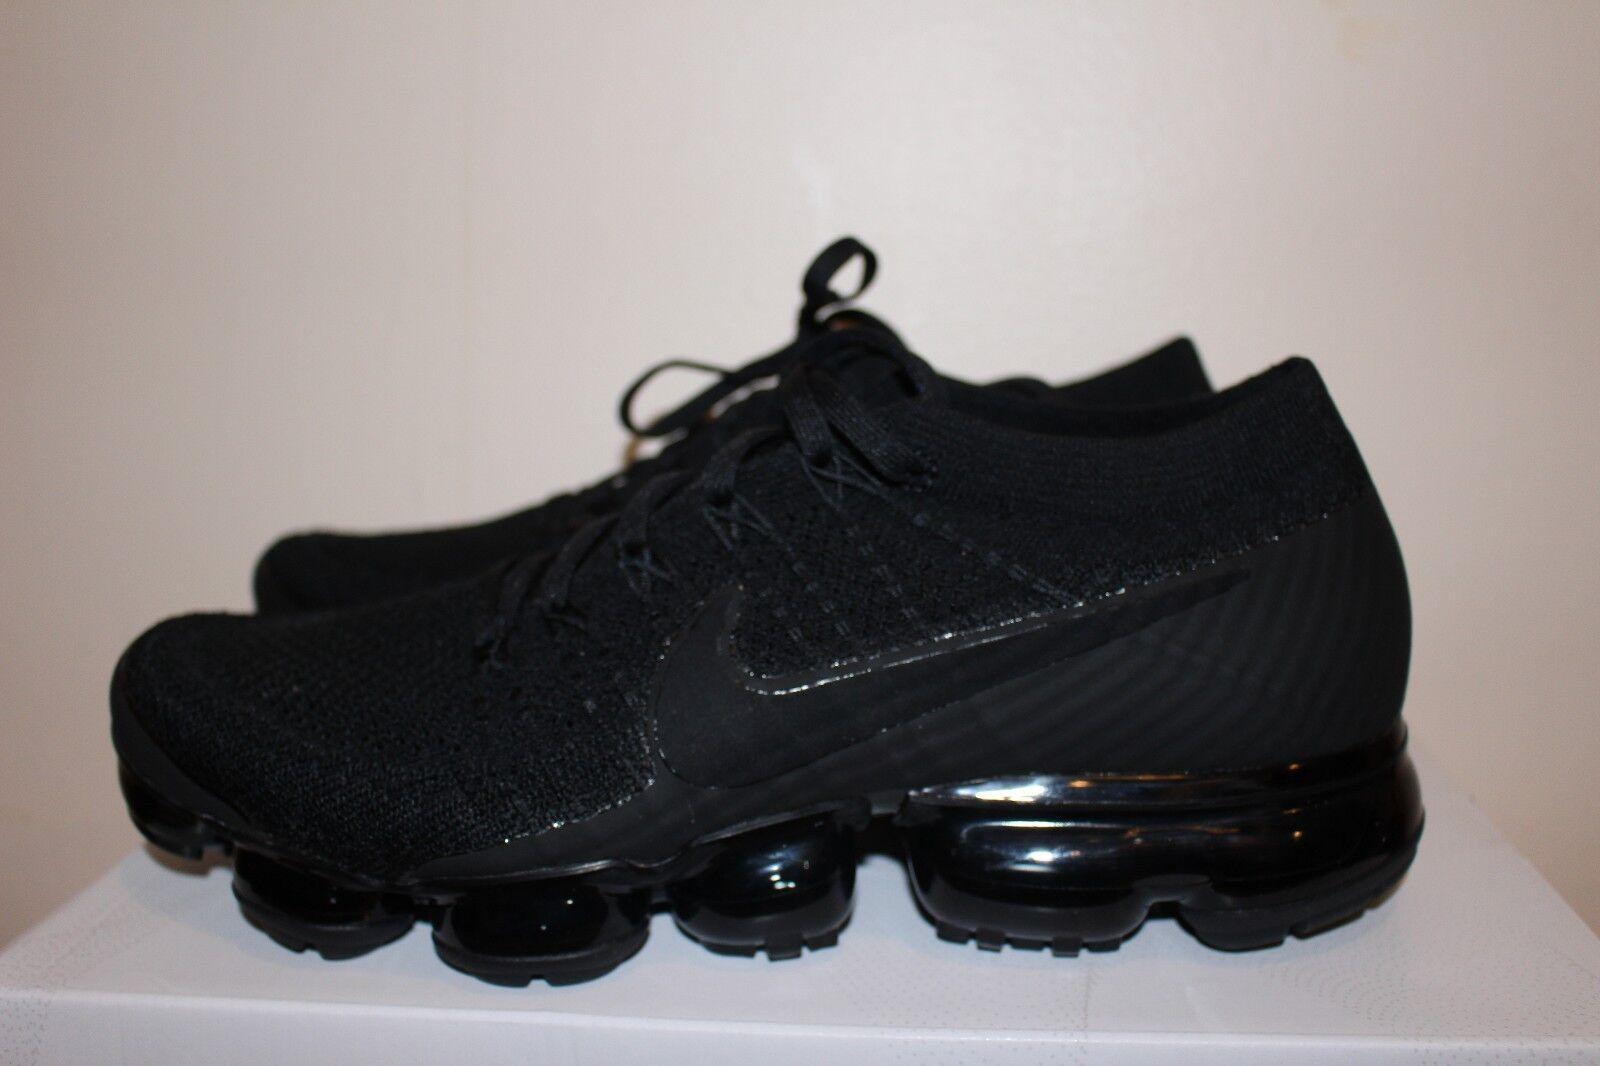 Nike Air VaporMax Flyknit TRIPLE BLACK NOIRE 849558-011 SIZE 8-13